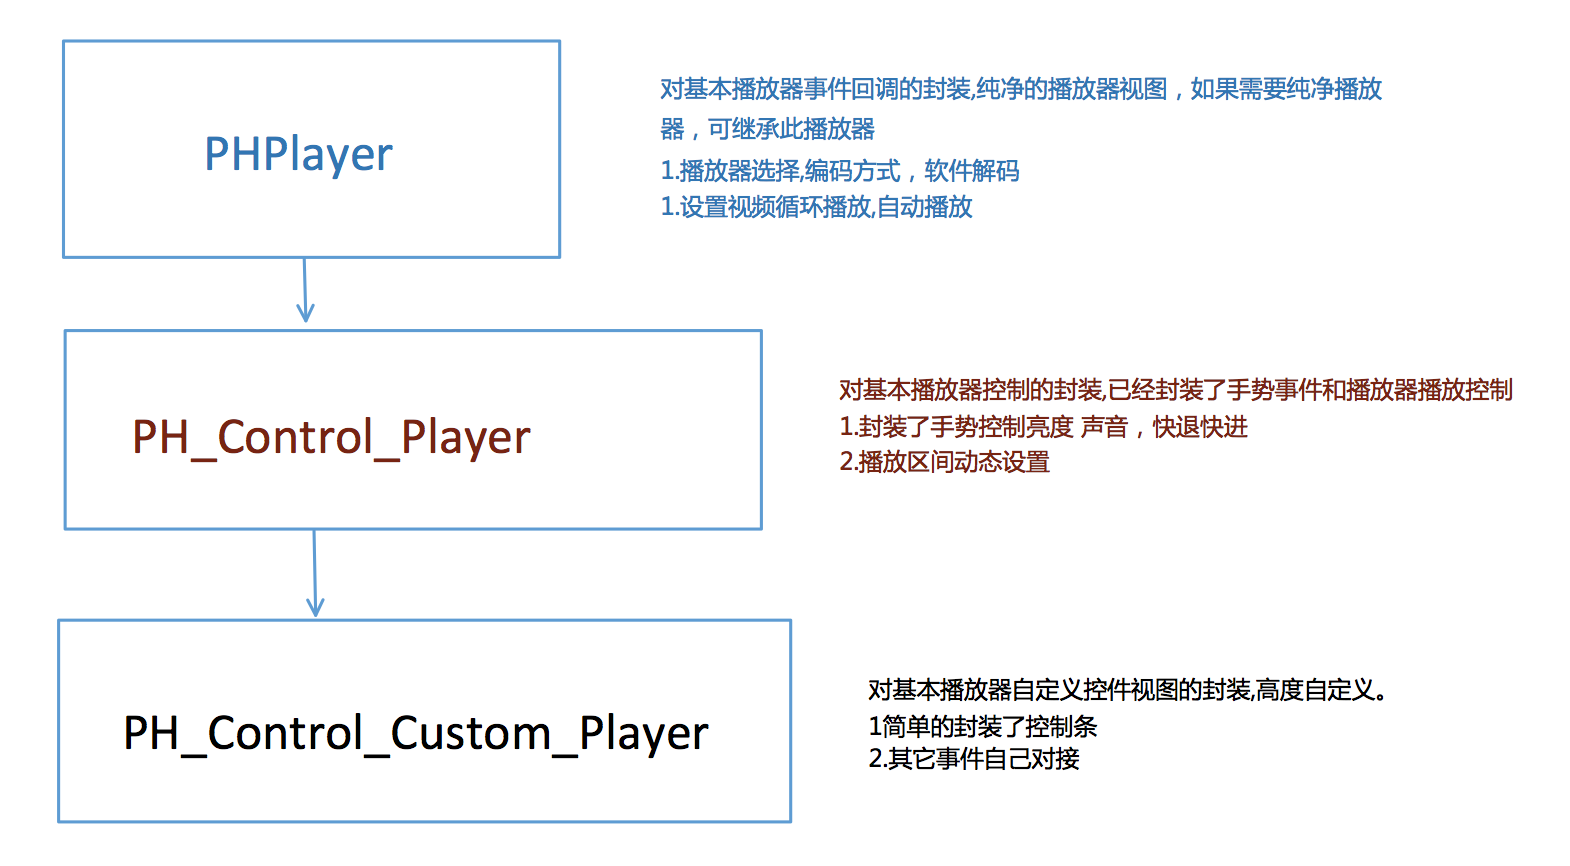 PHPlayer